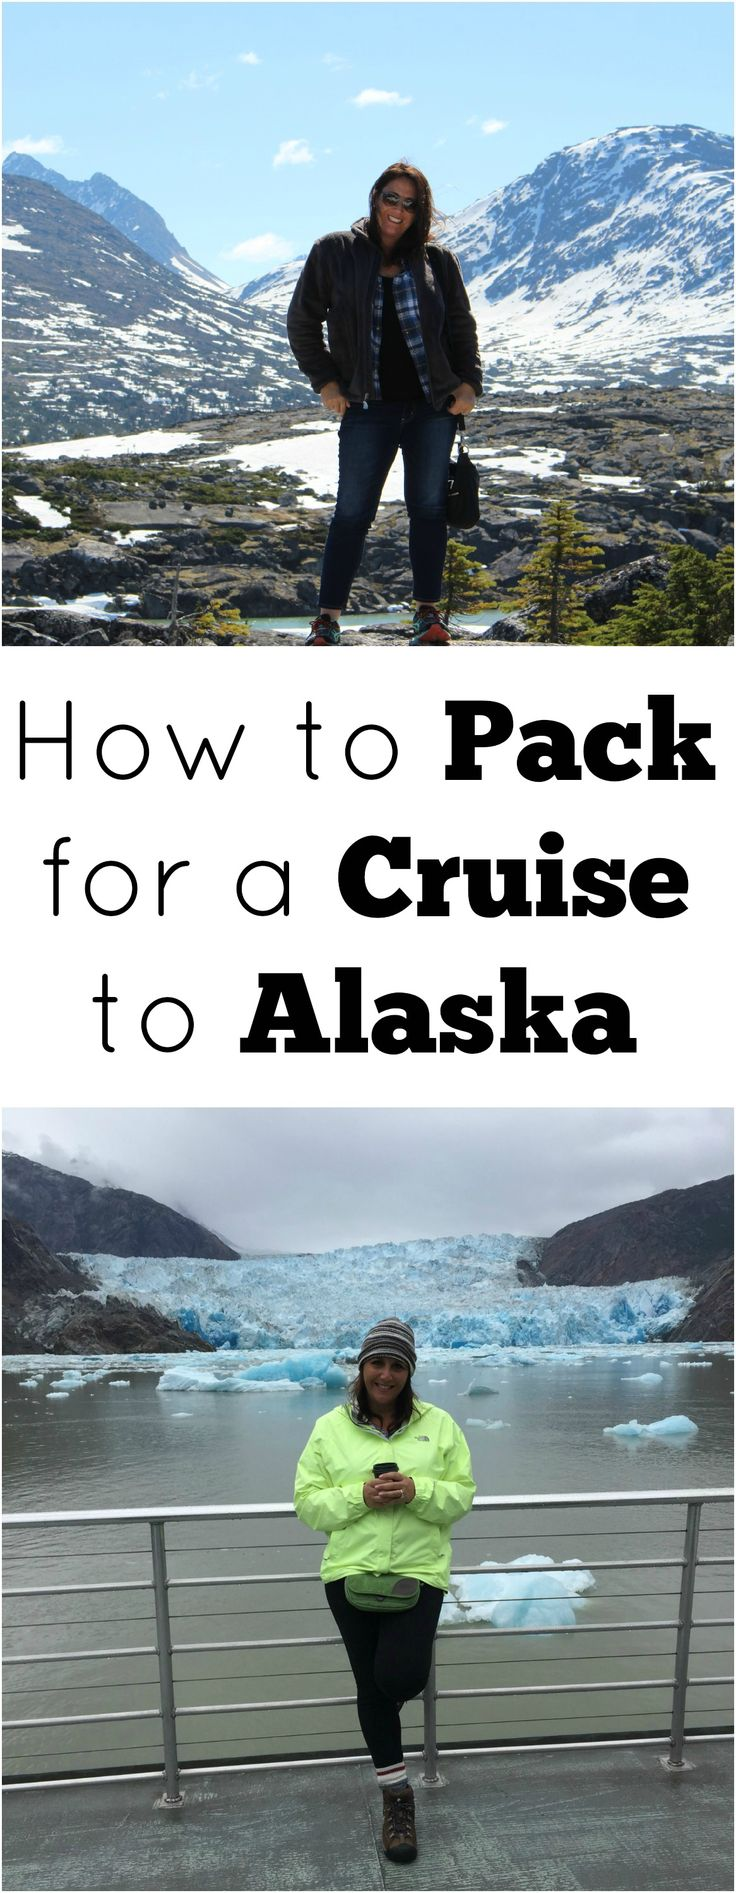 How to pack for a cruise to Alaska - printable packing list and advice #travel #alaska #alaskacruise #comebacknew